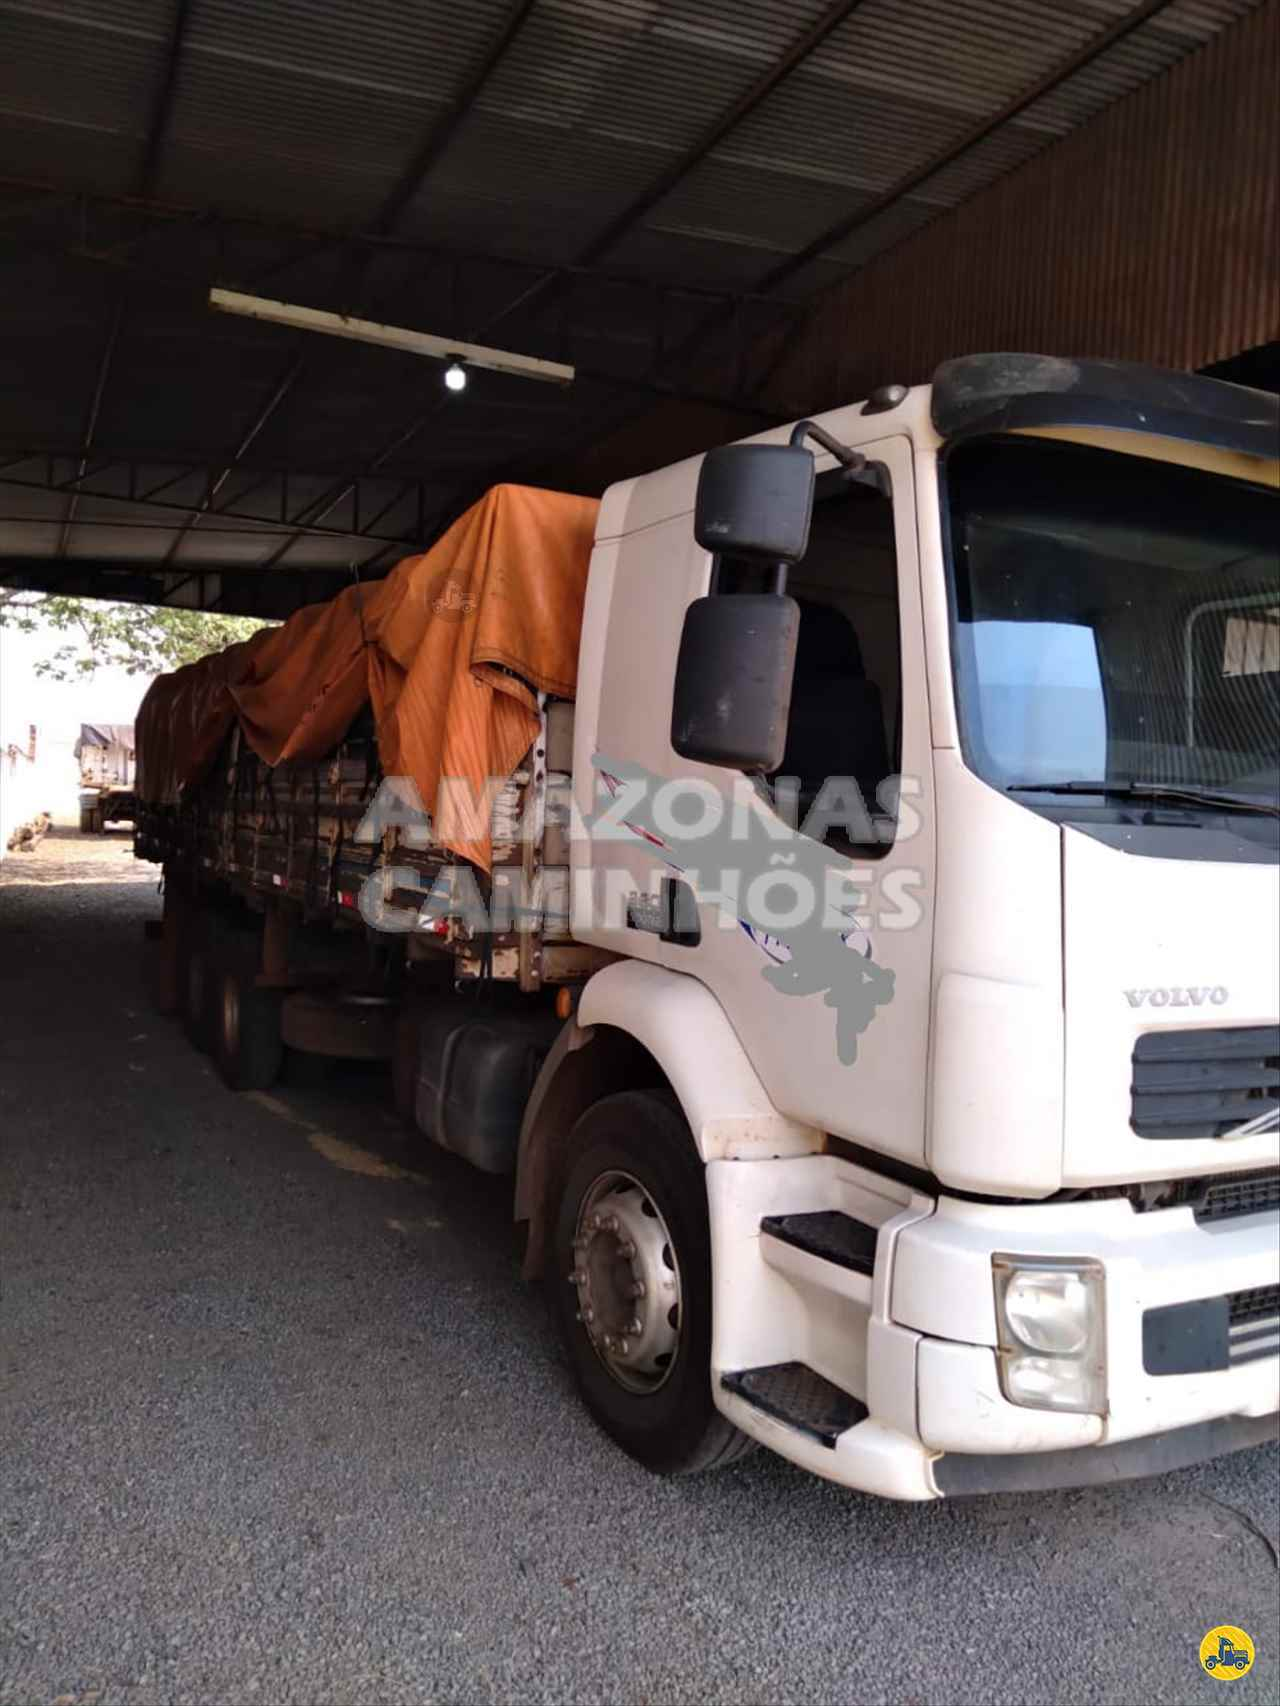 CAMINHAO VOLVO VOLVO VM 260 Chassis Truck 6x2 Amazonas Caminhões - SP MARILIA SÃO PAULO SP